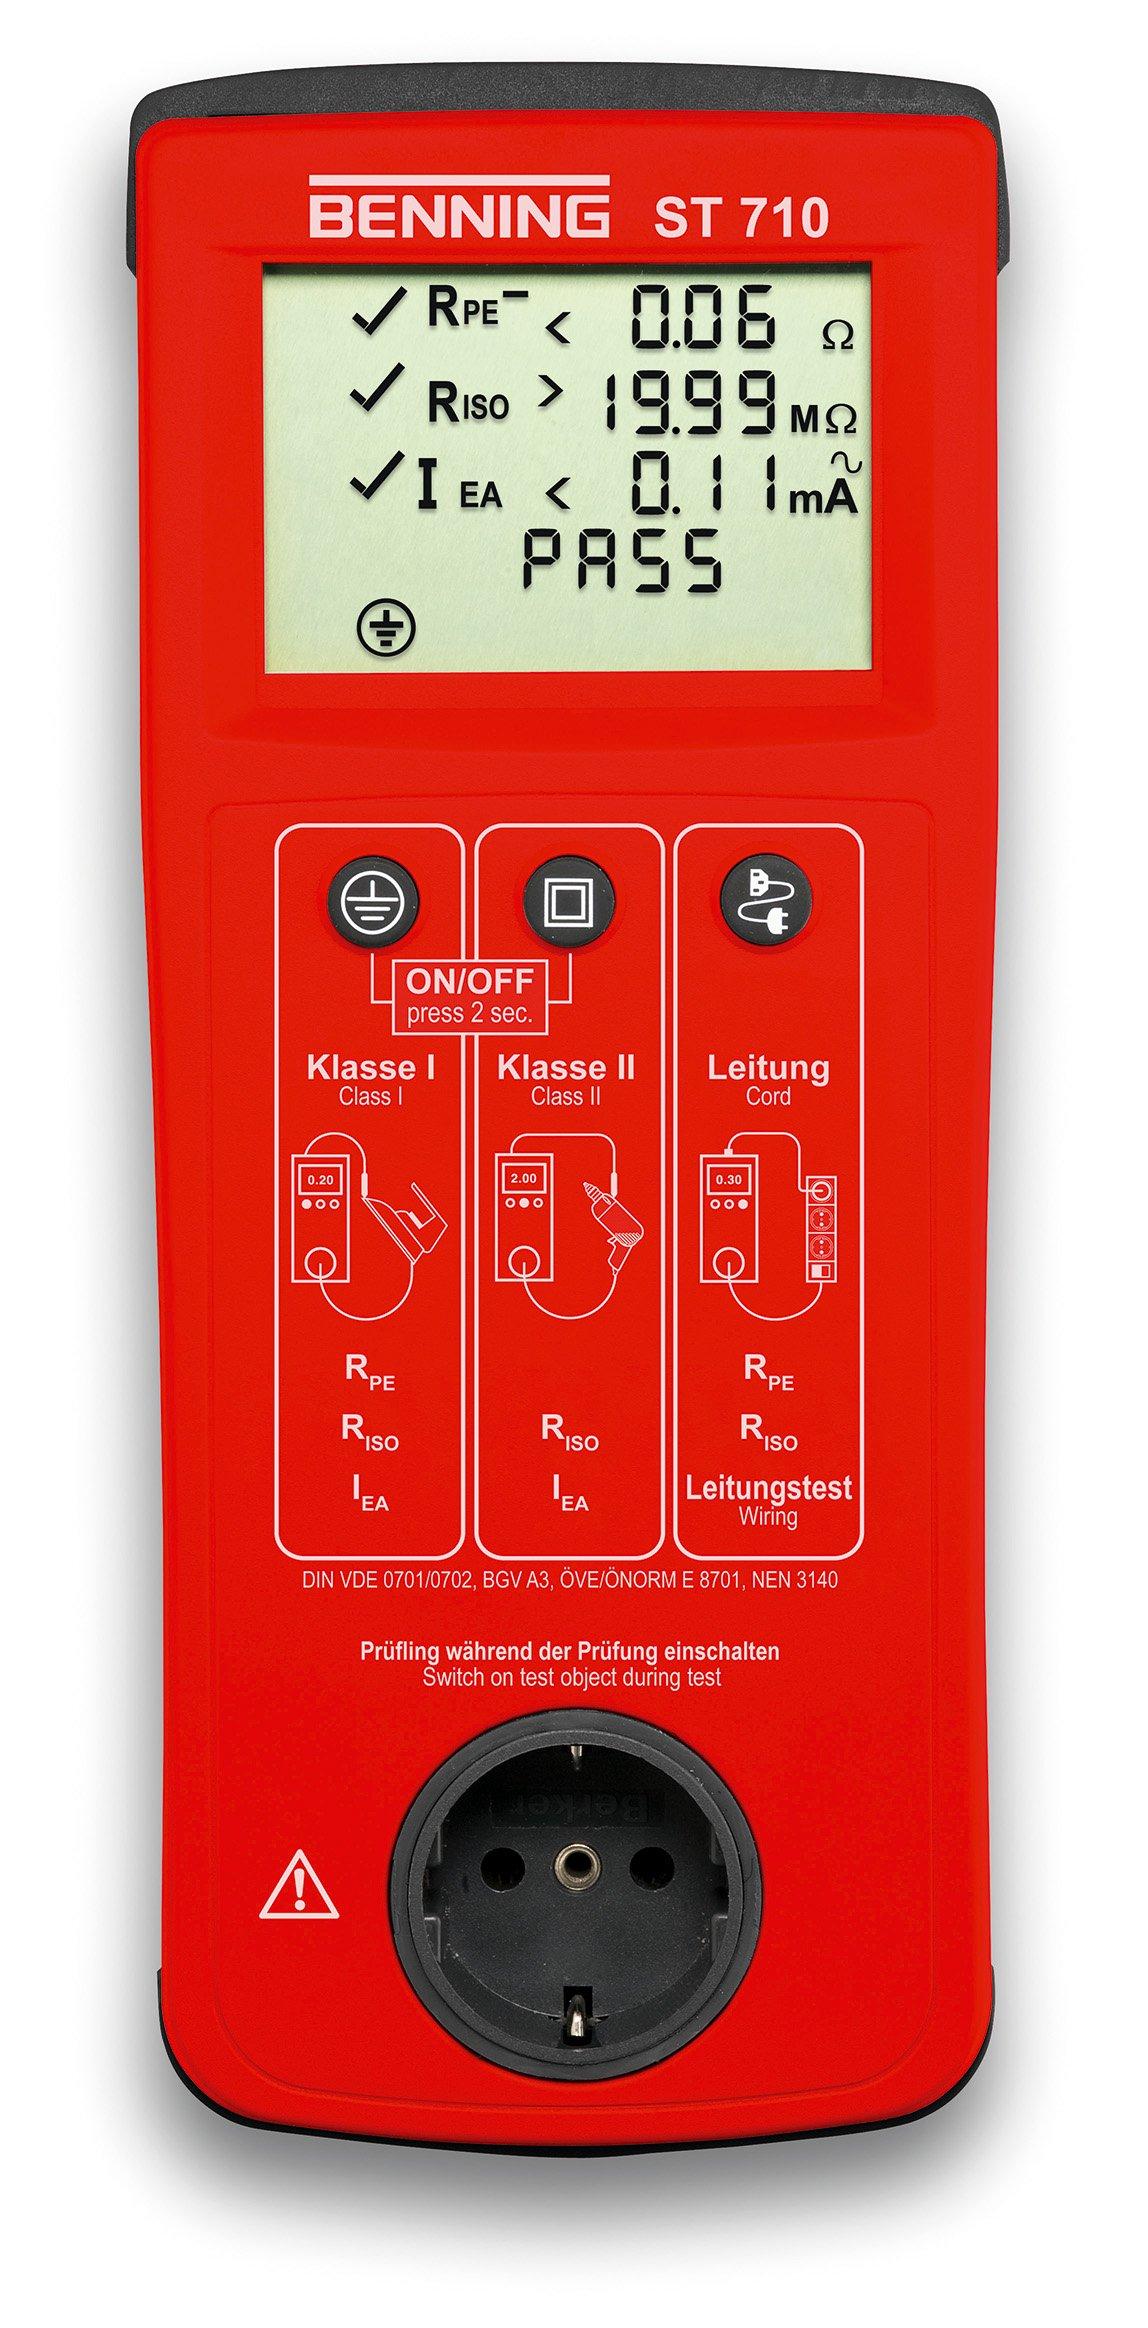 Benning 050308 ST 710 Kontrollinstrument, rot product image